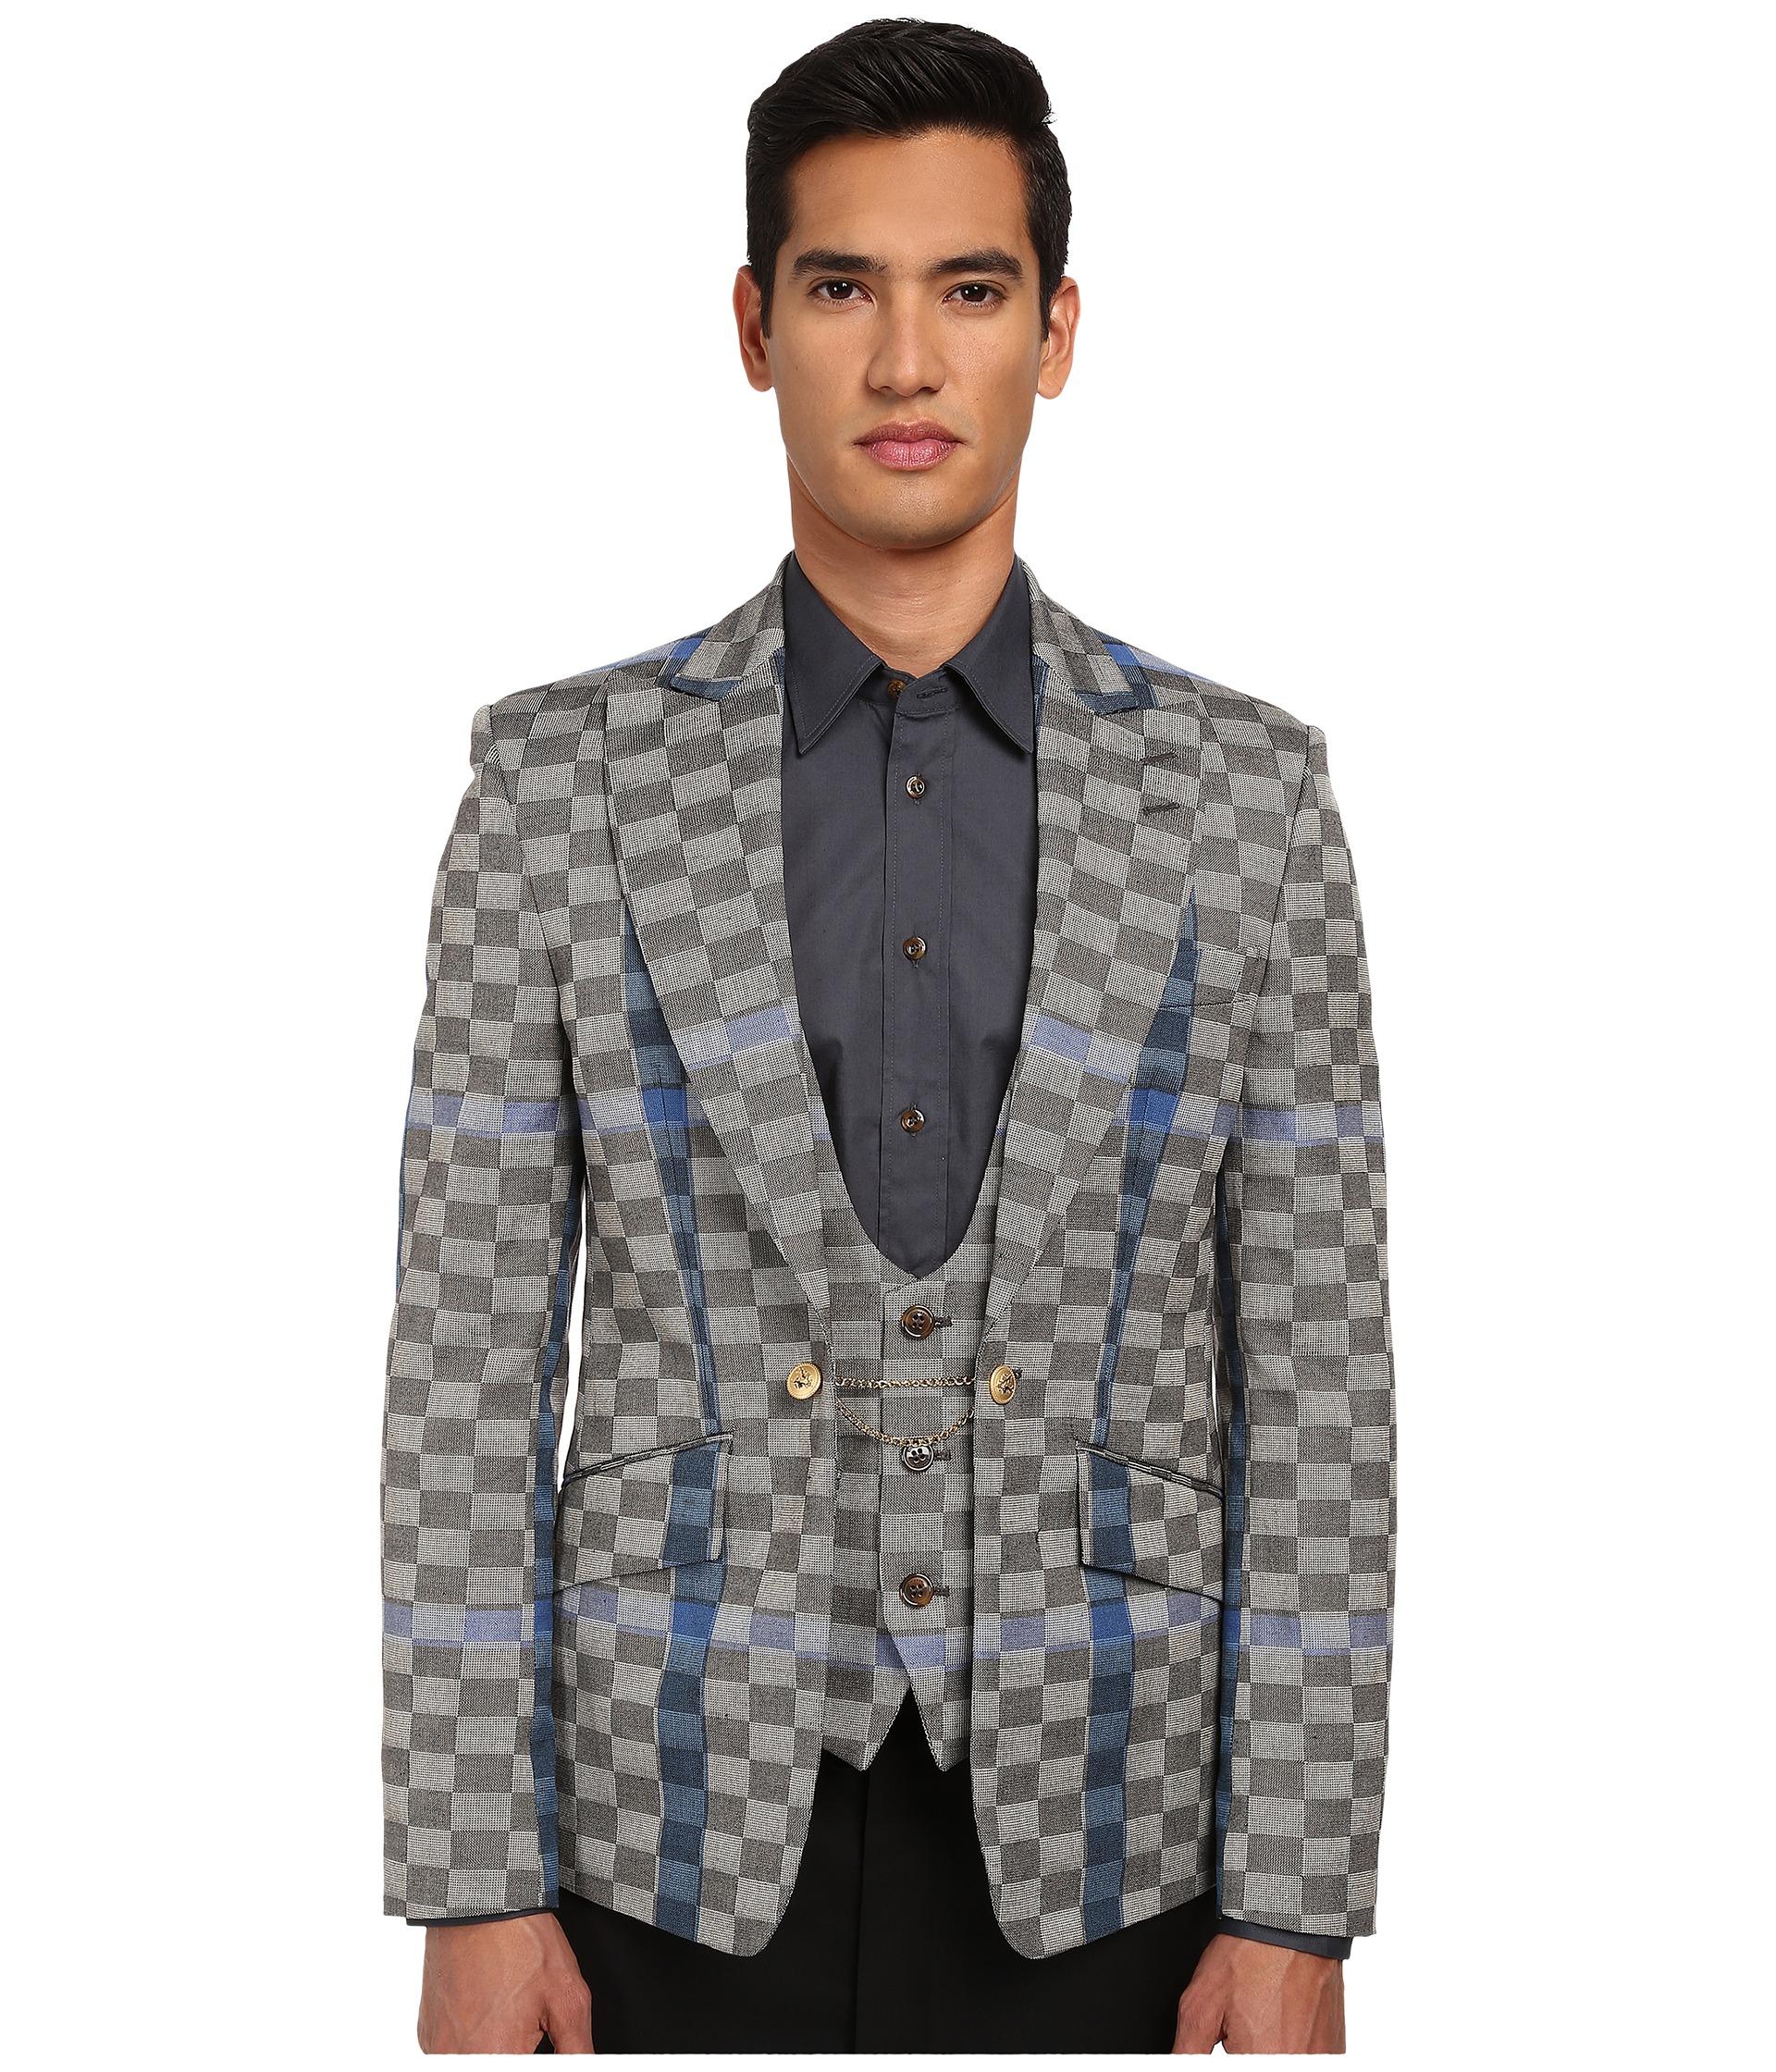 Basket Weave Vest Pattern : Vivienne westwood basket weave check waistcoat jacket in